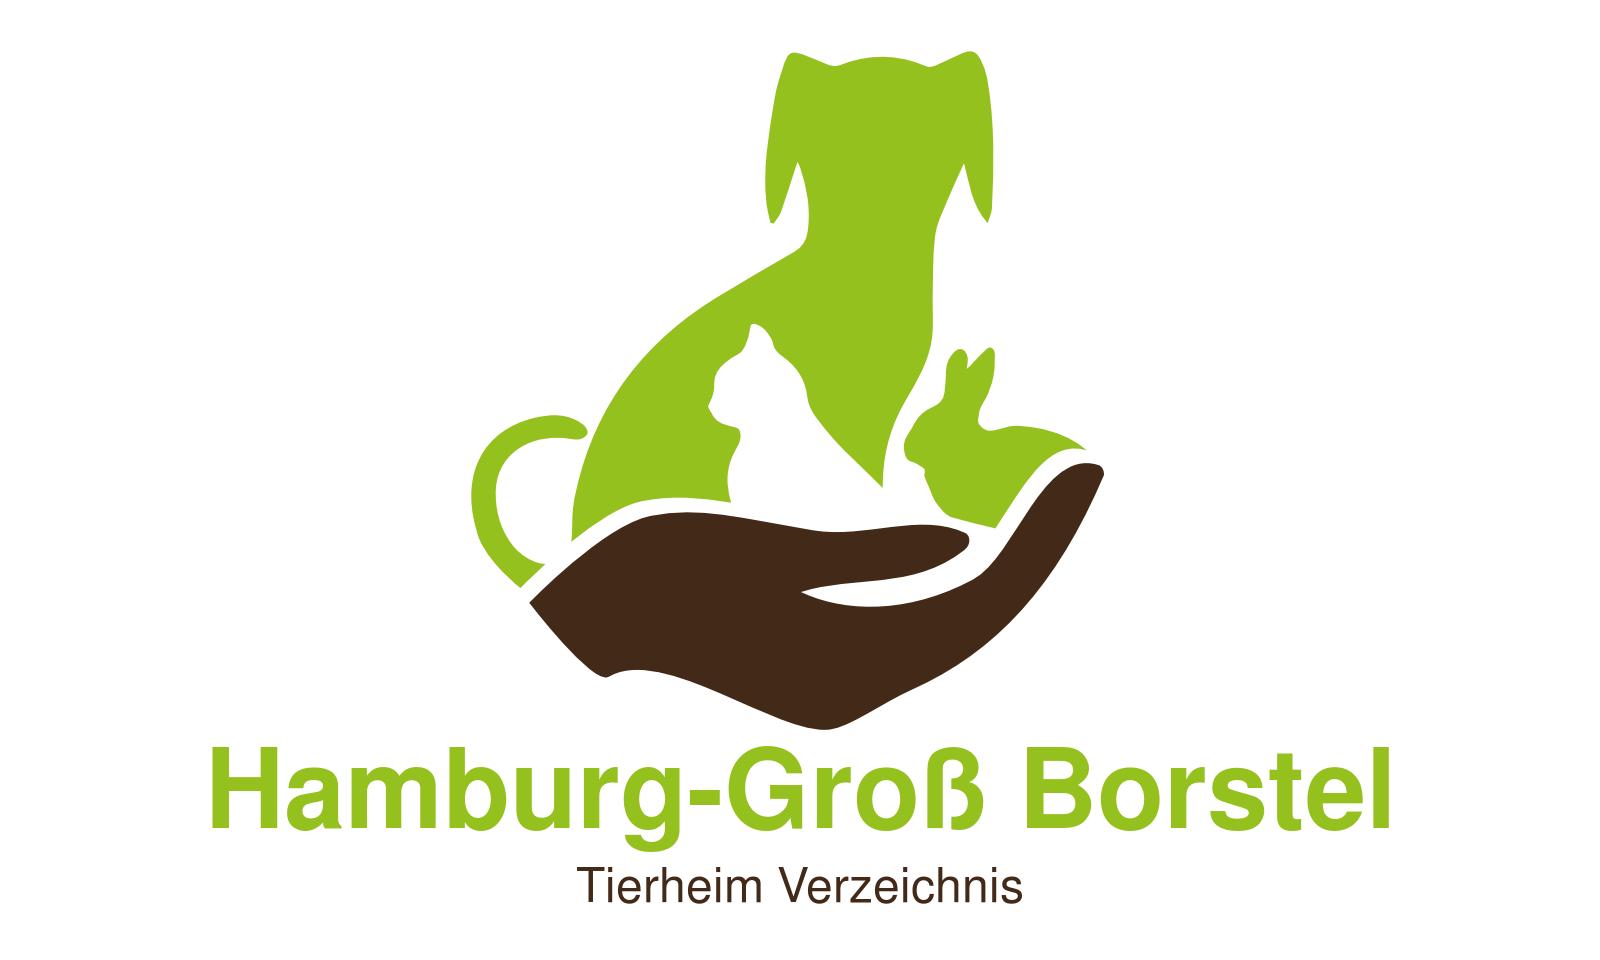 Tierheim Hamburg Groß Borstel